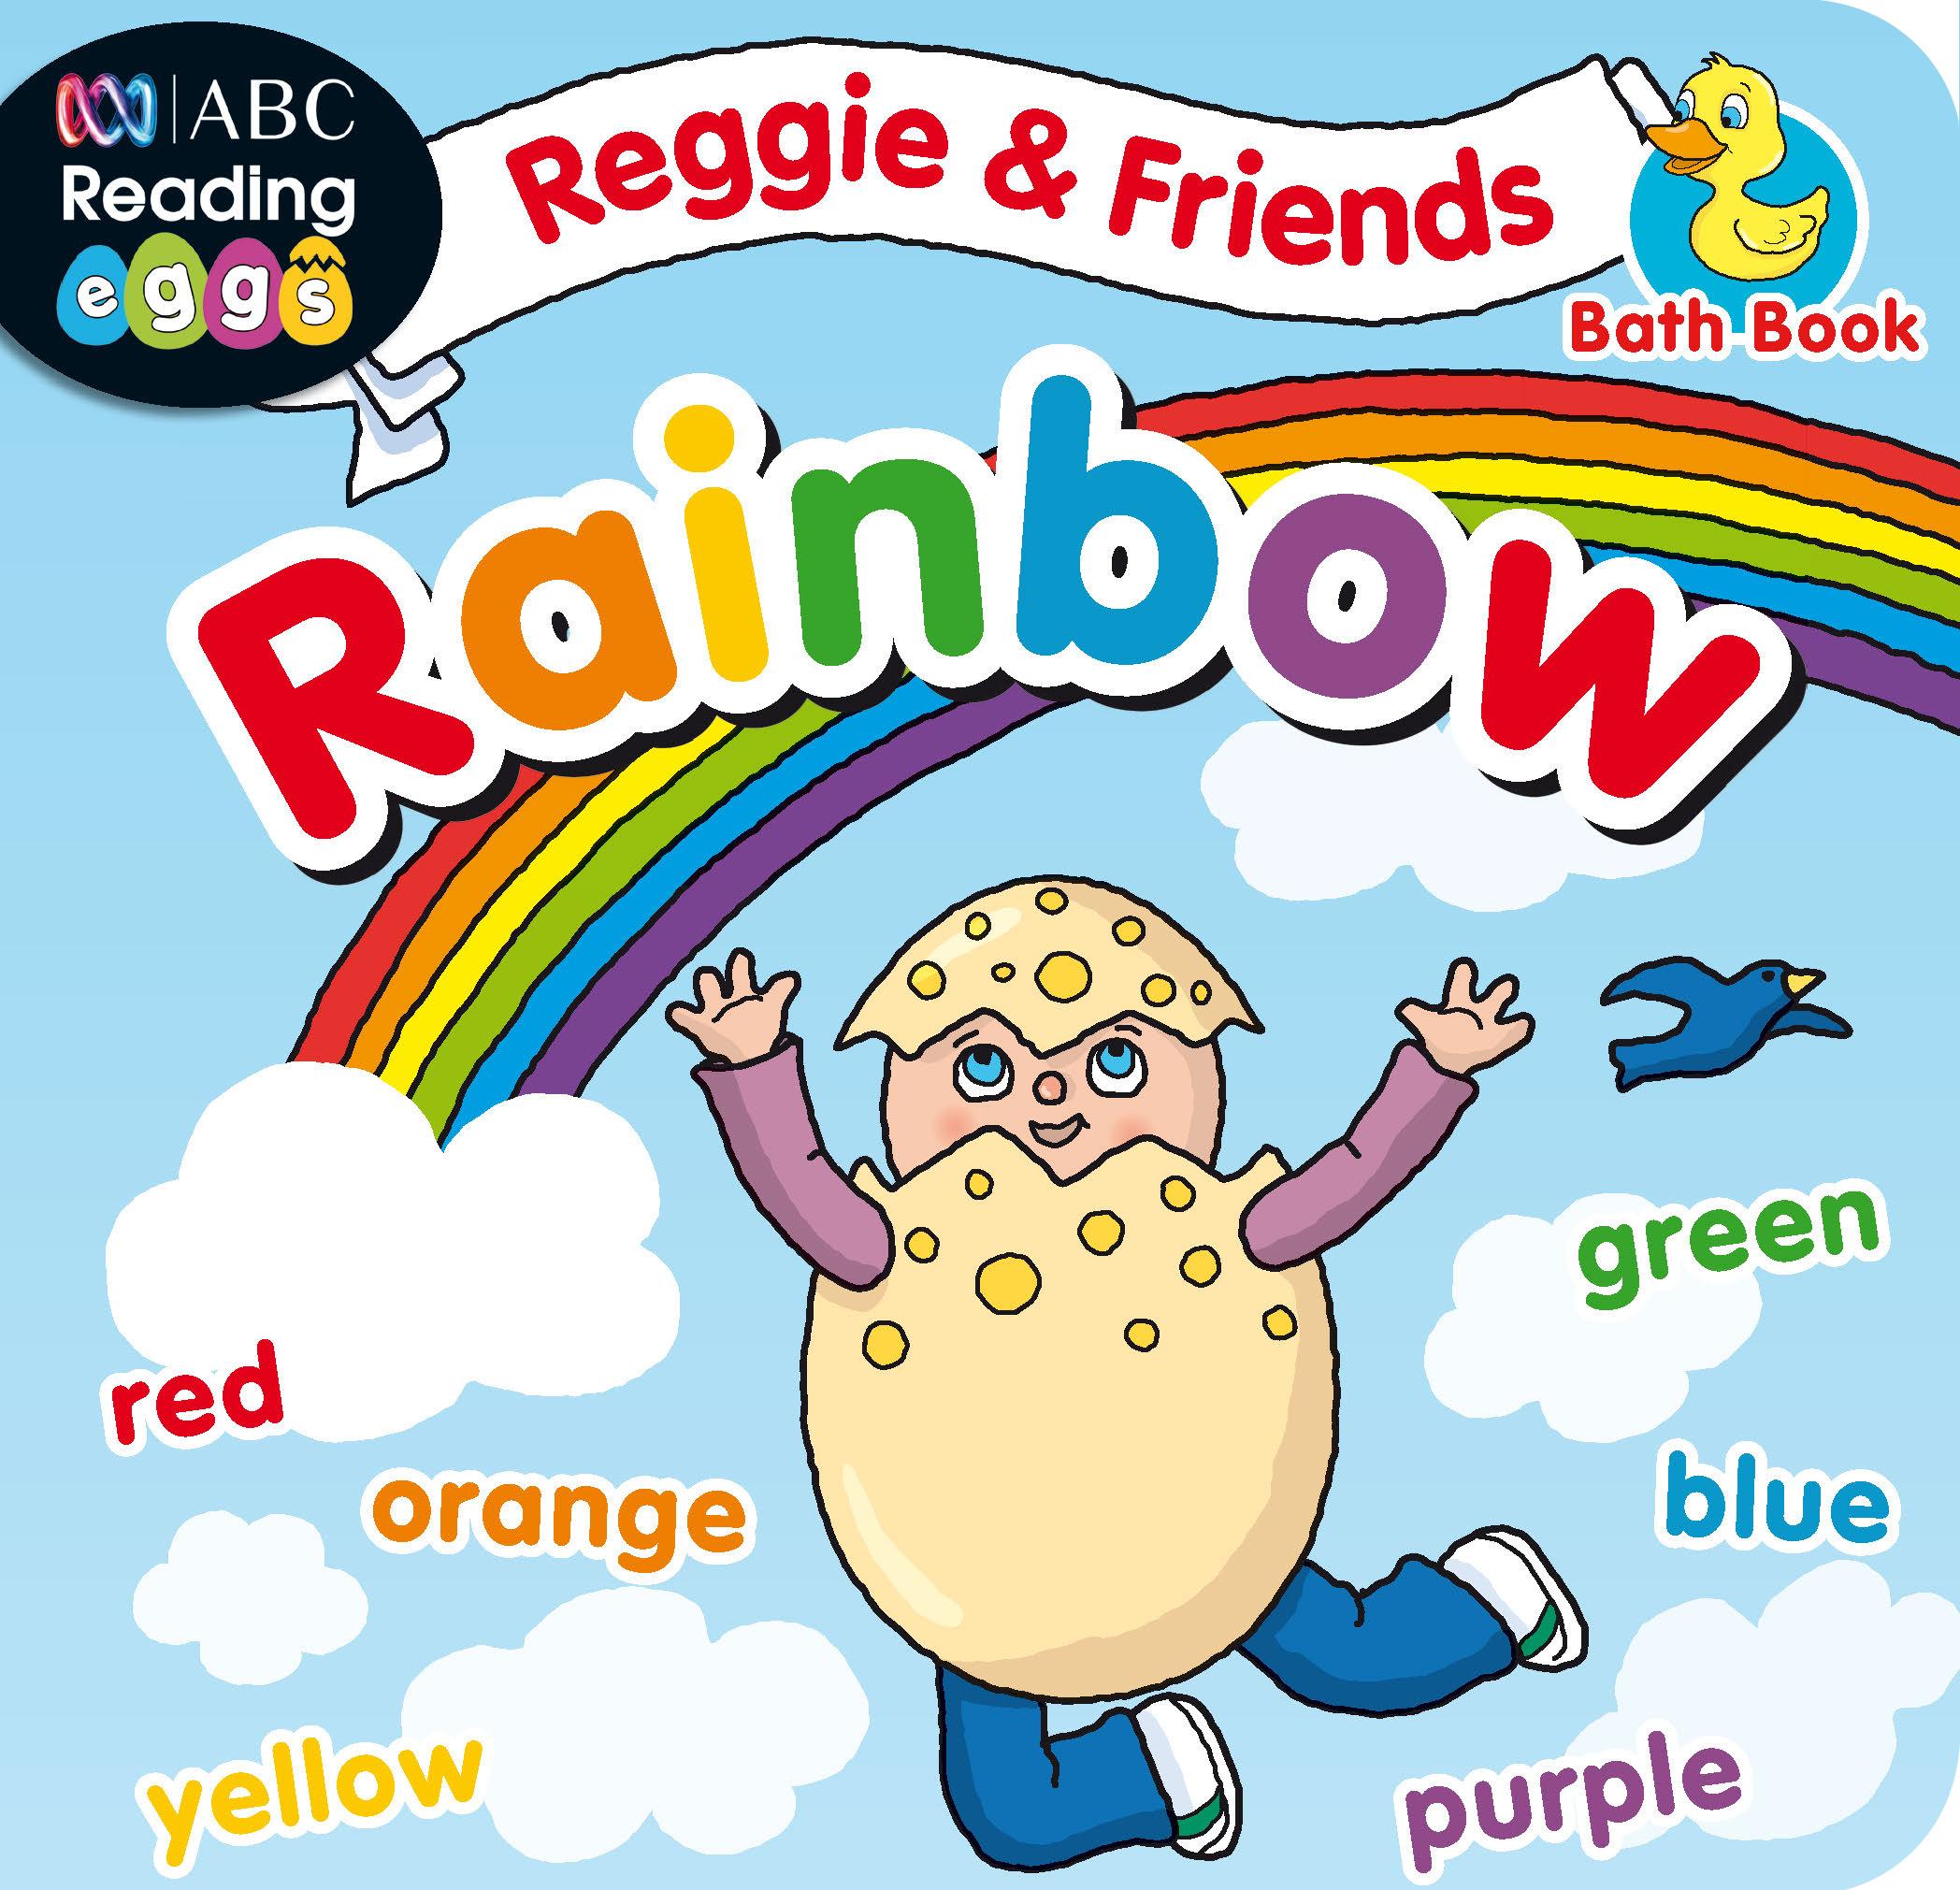 Picture of ABC Reading Eggs Bath Book - Reggie & Friends: Rainbow